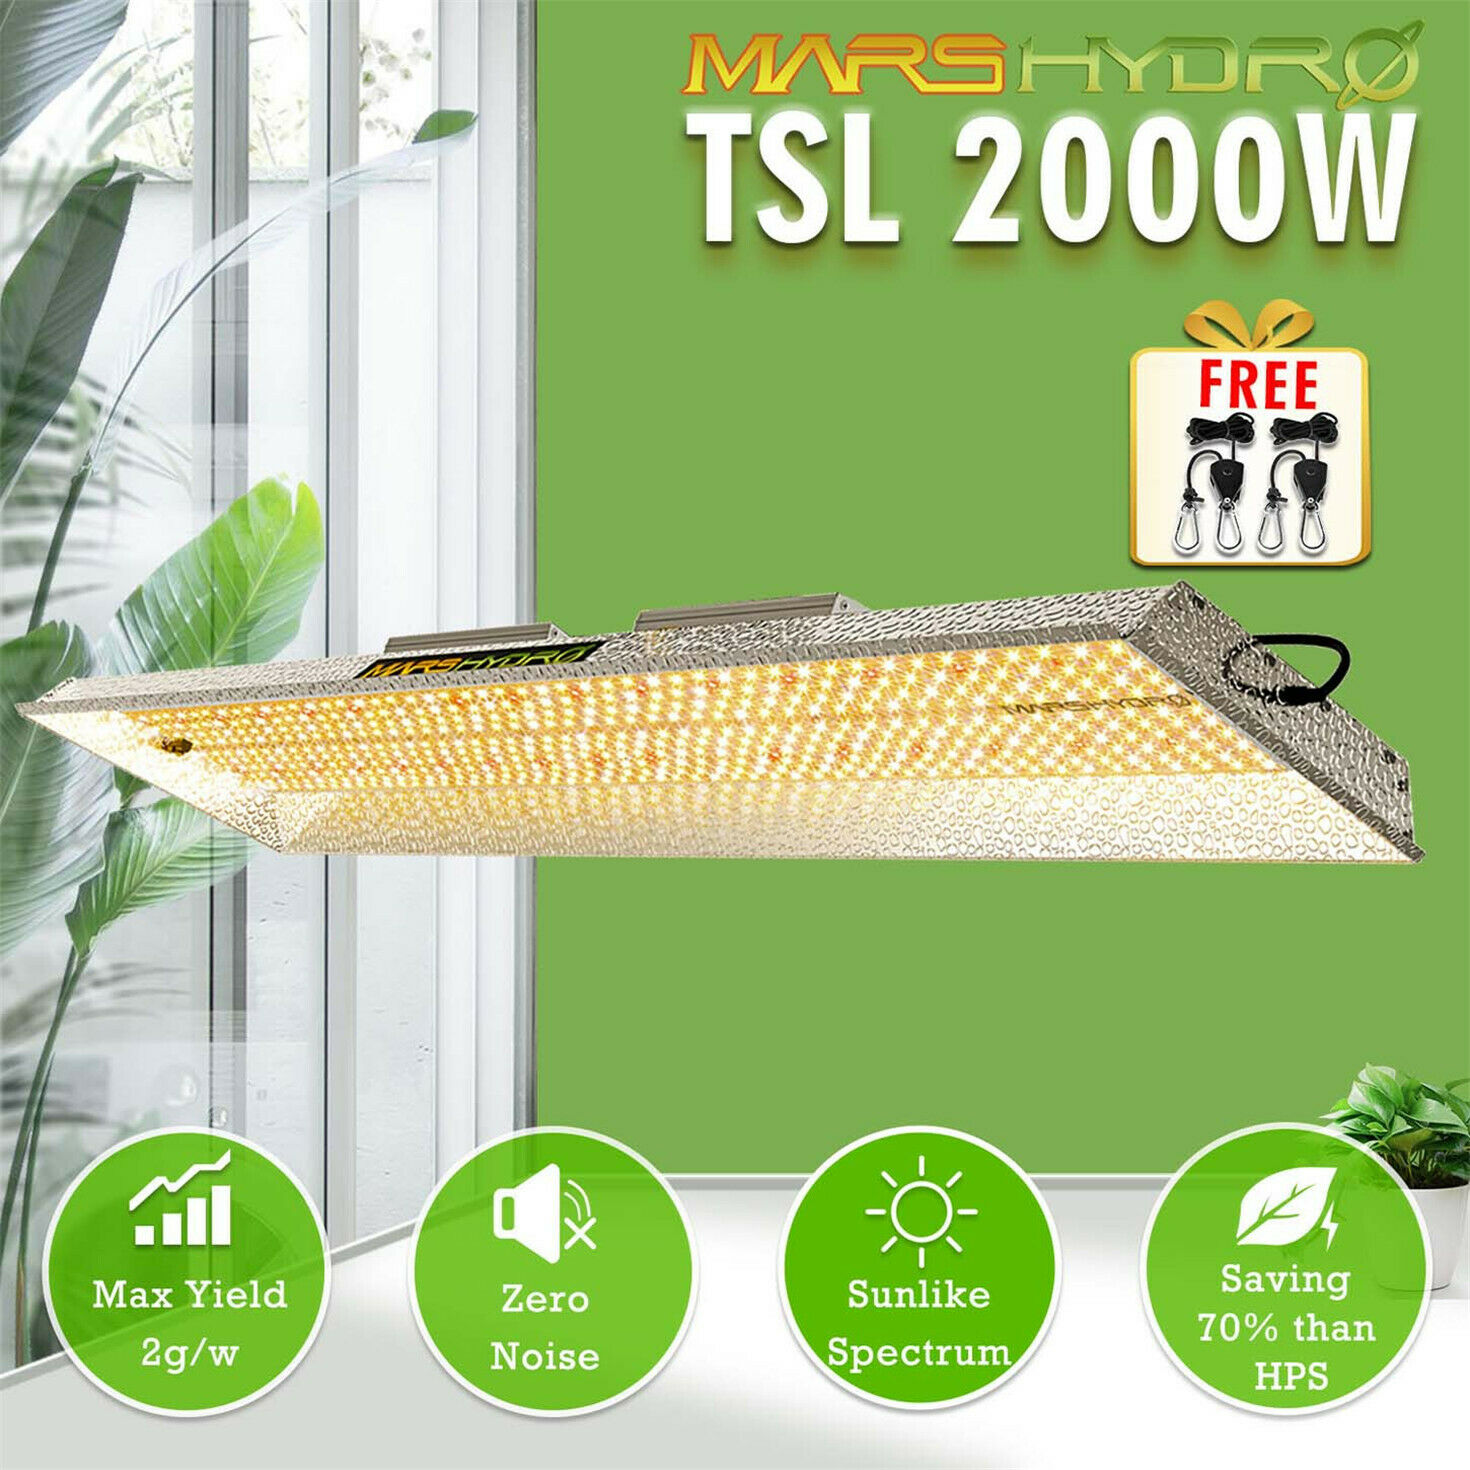 Mars Hydro TSL 2000W LED Grow Light Sunlike Full Spectrum For Veg And Bloom Hydroponics